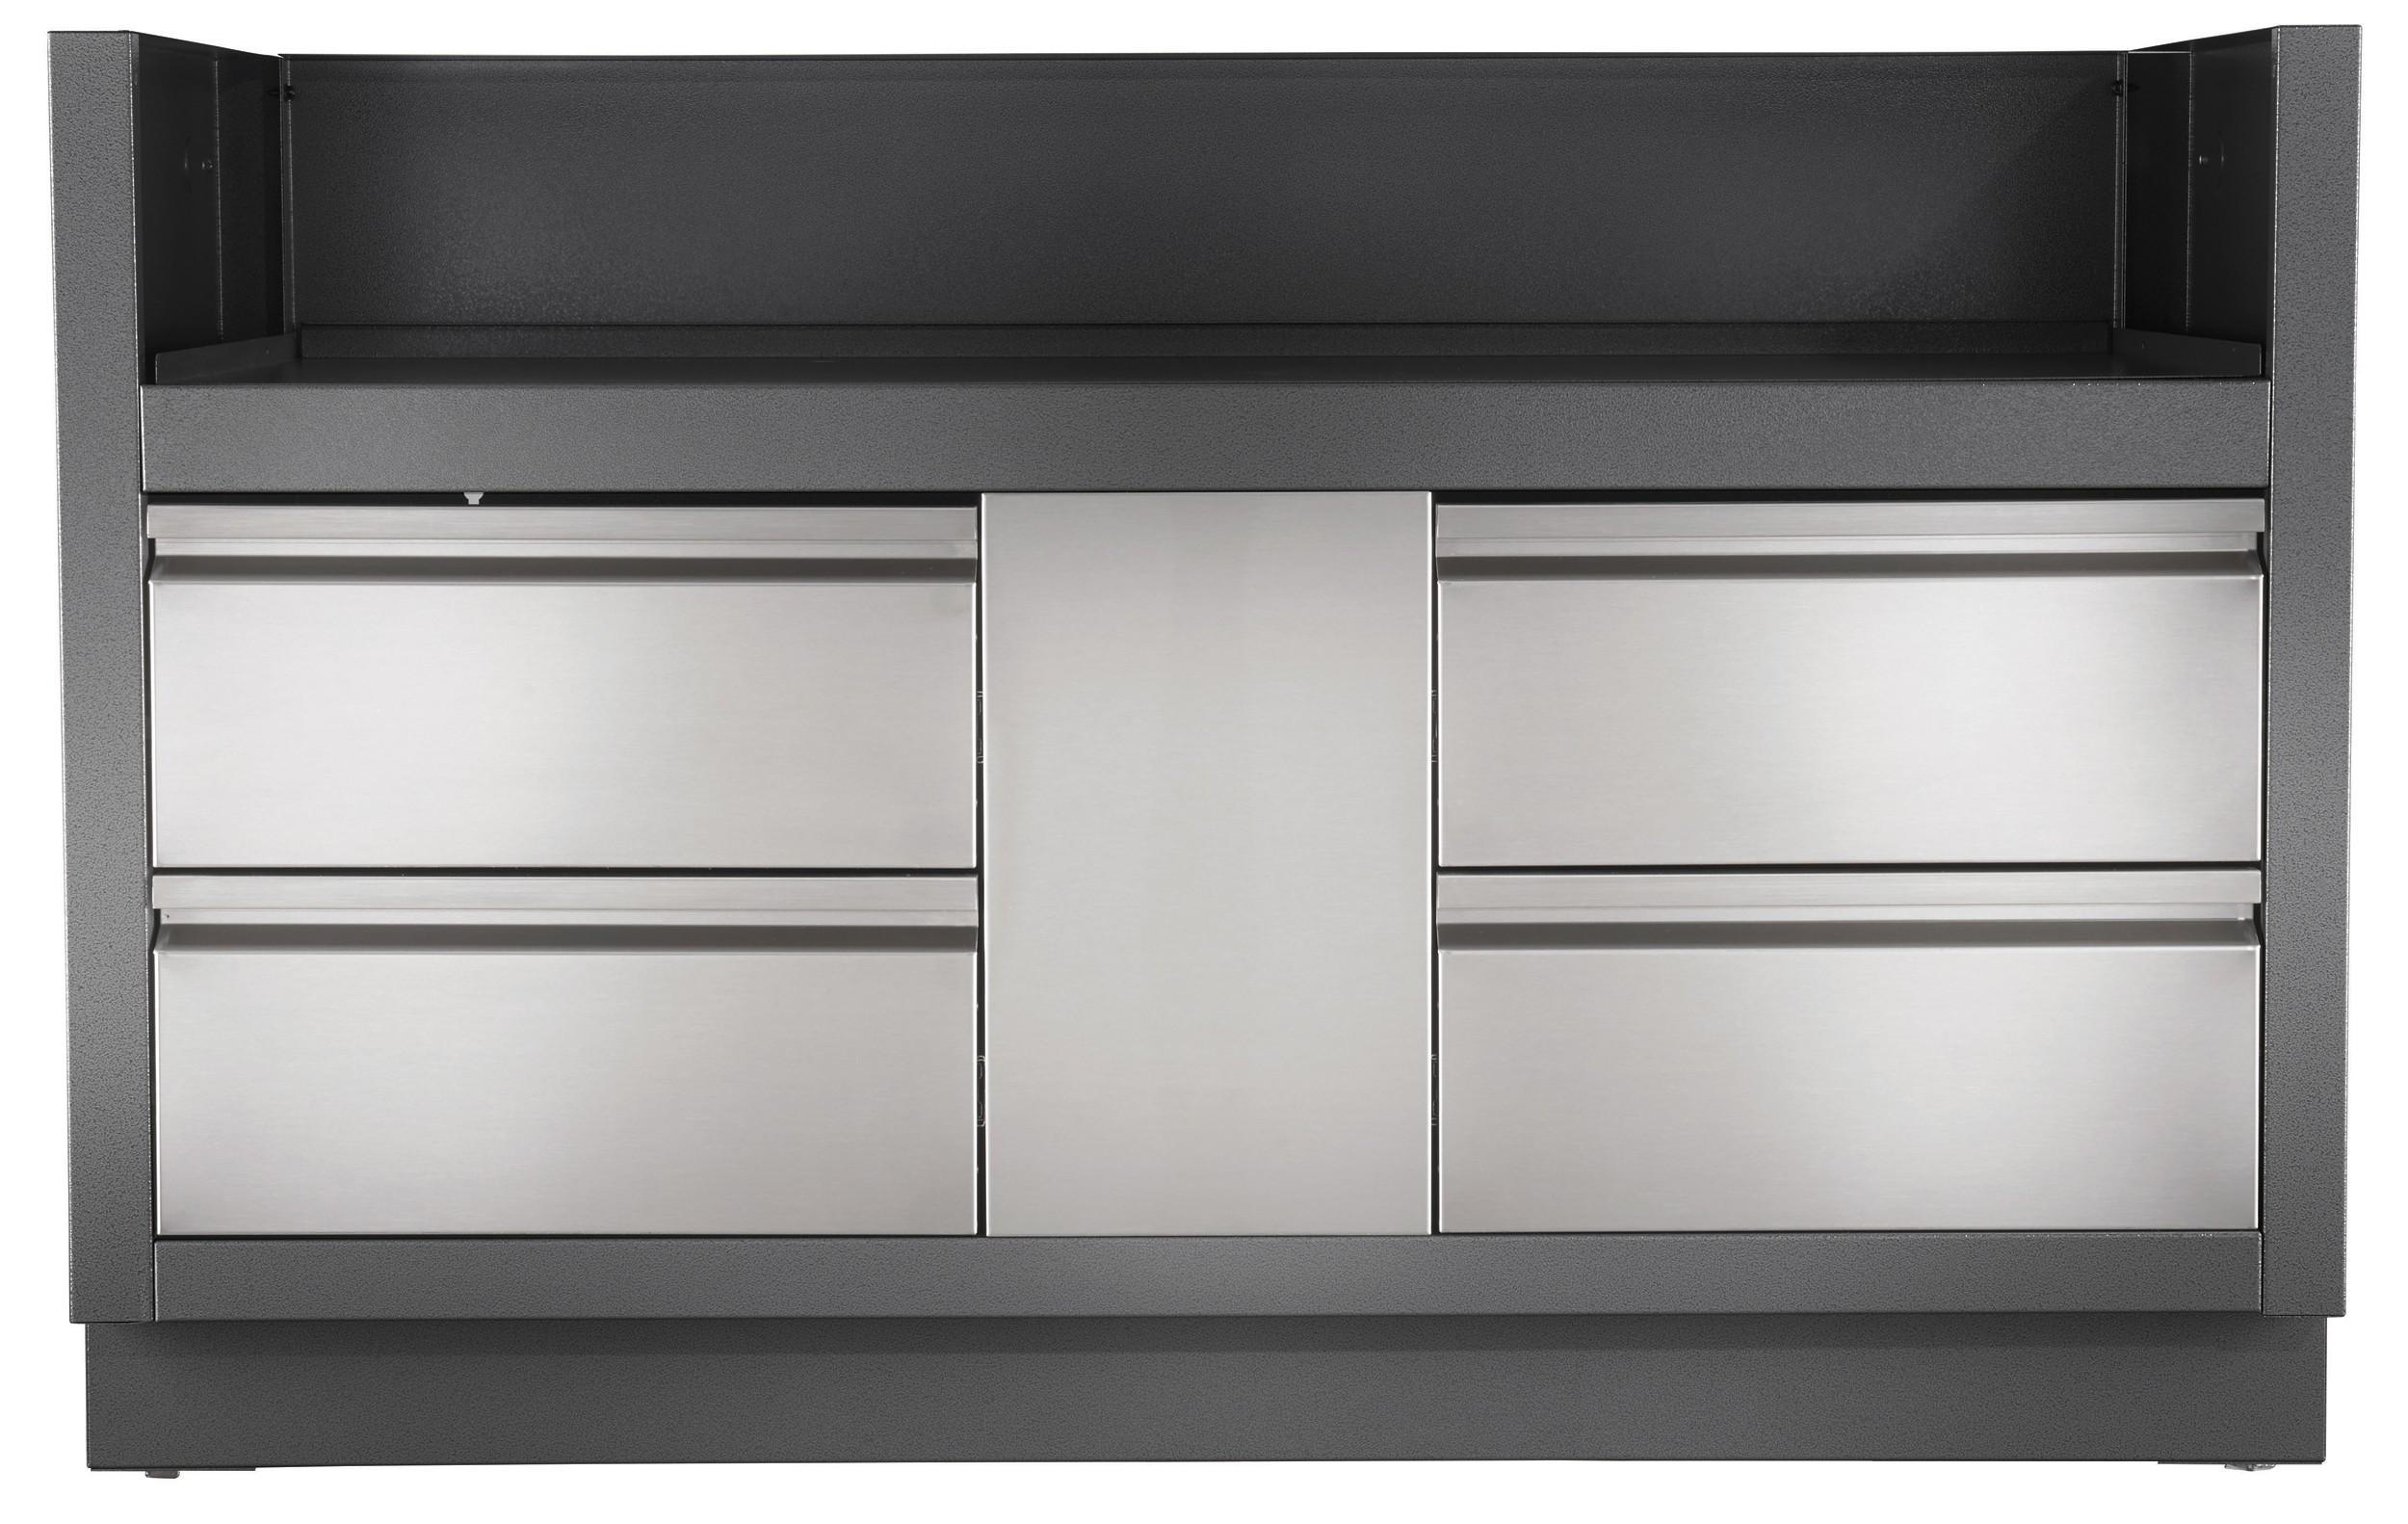 au enk che einbau grill unterschrank napoleon oasis f r 825 bei. Black Bedroom Furniture Sets. Home Design Ideas